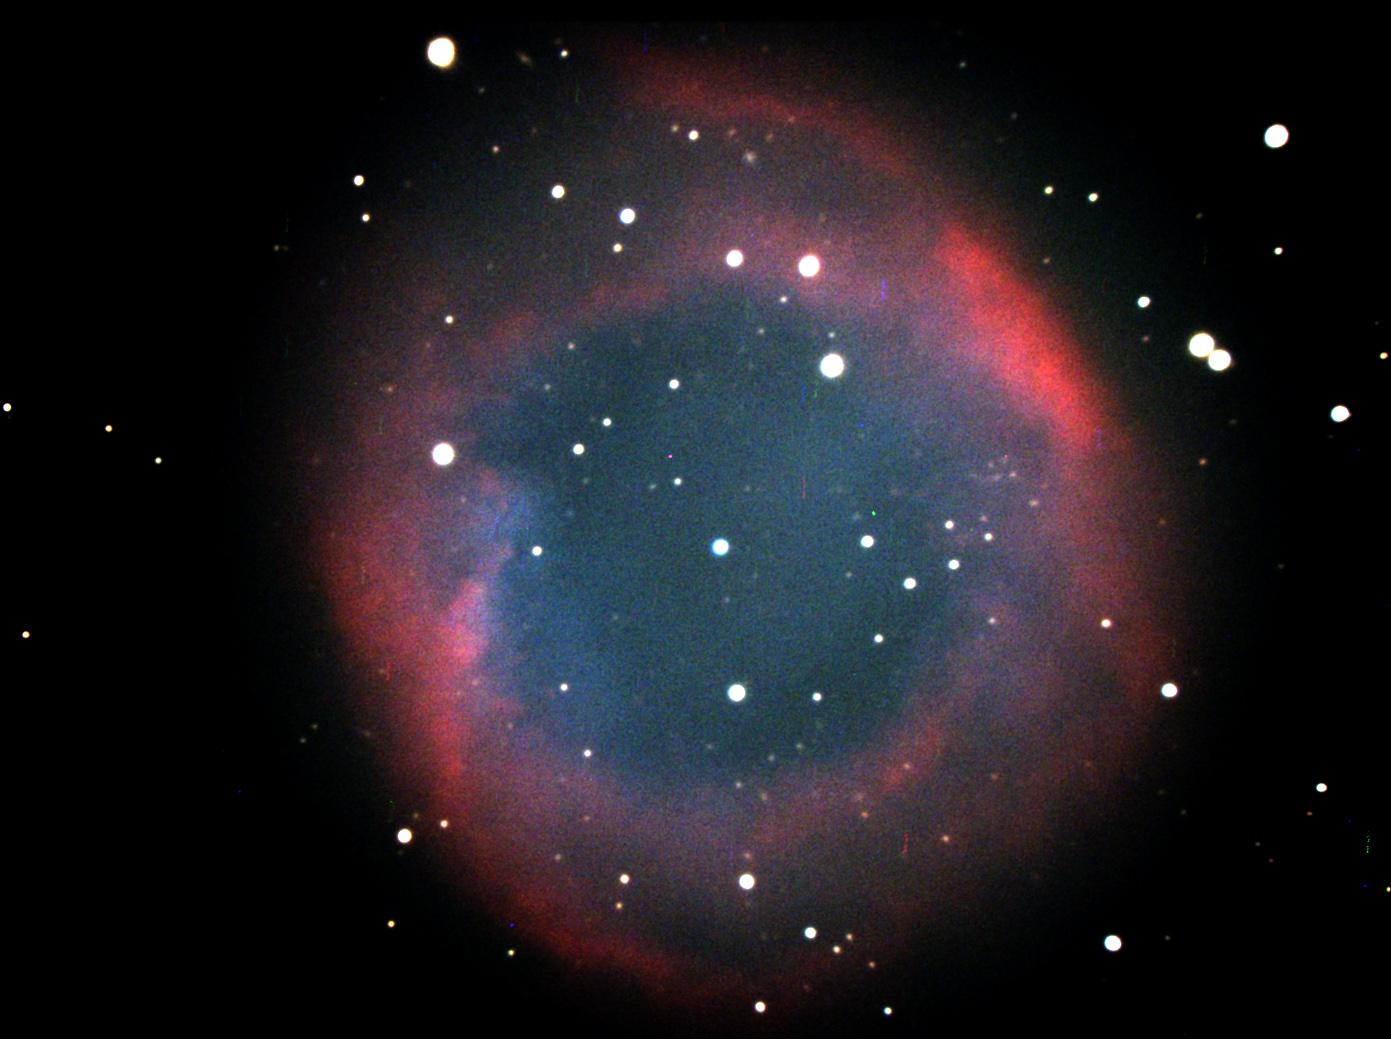 helix-nebula-ngc7293-21-30-sec-f0d66bb26a0c54a72e90db08f410e7fcc74ae63d